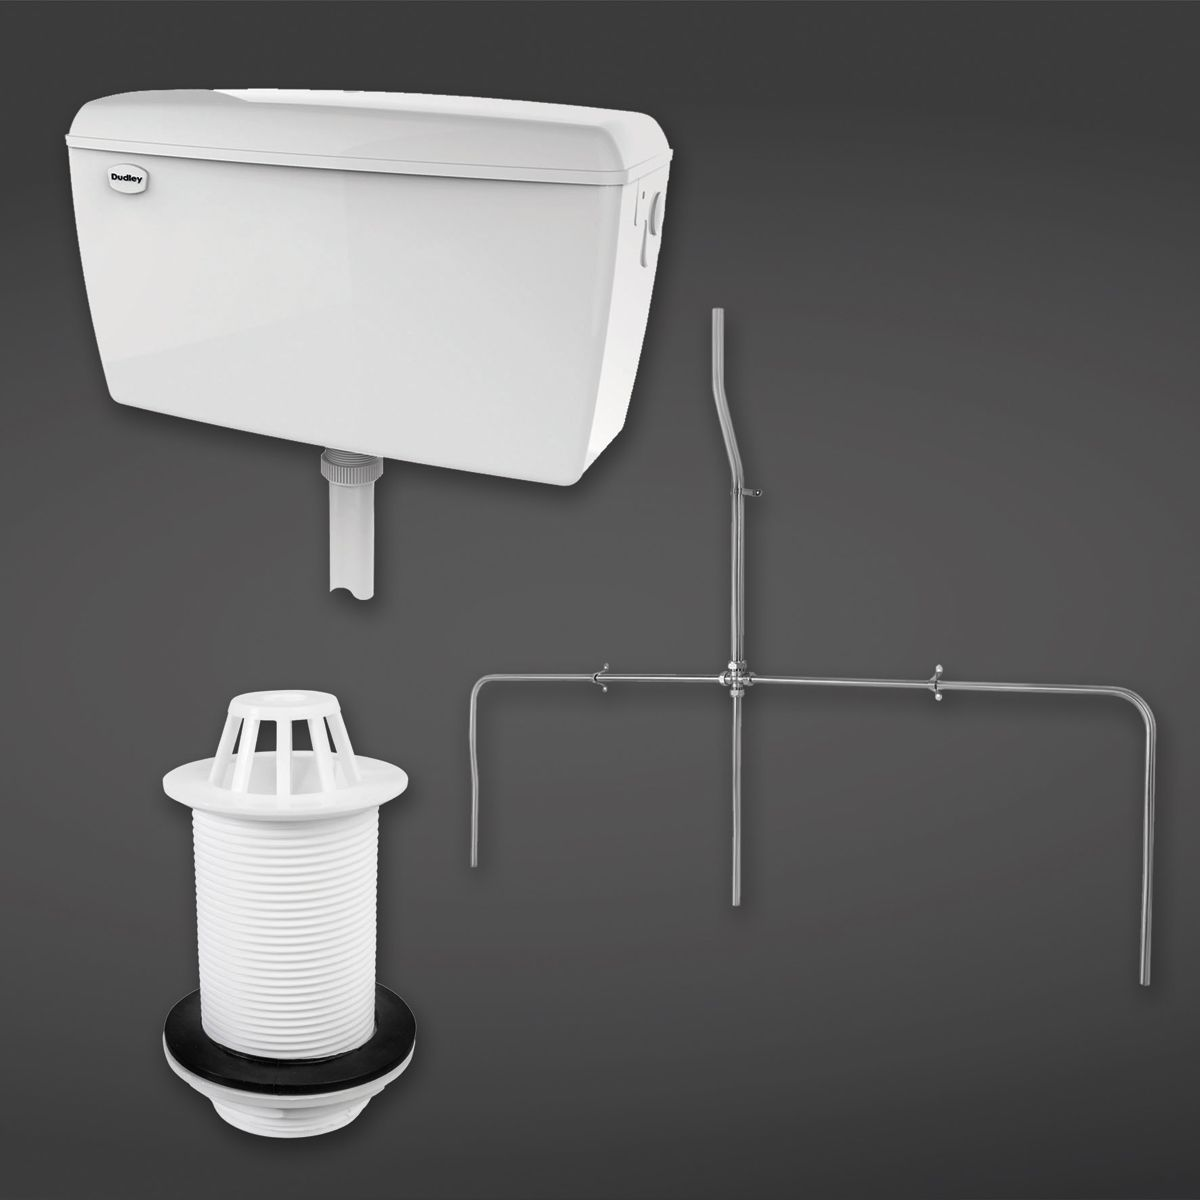 RAK Exposed Automatic Urinal Cistern 13.5L